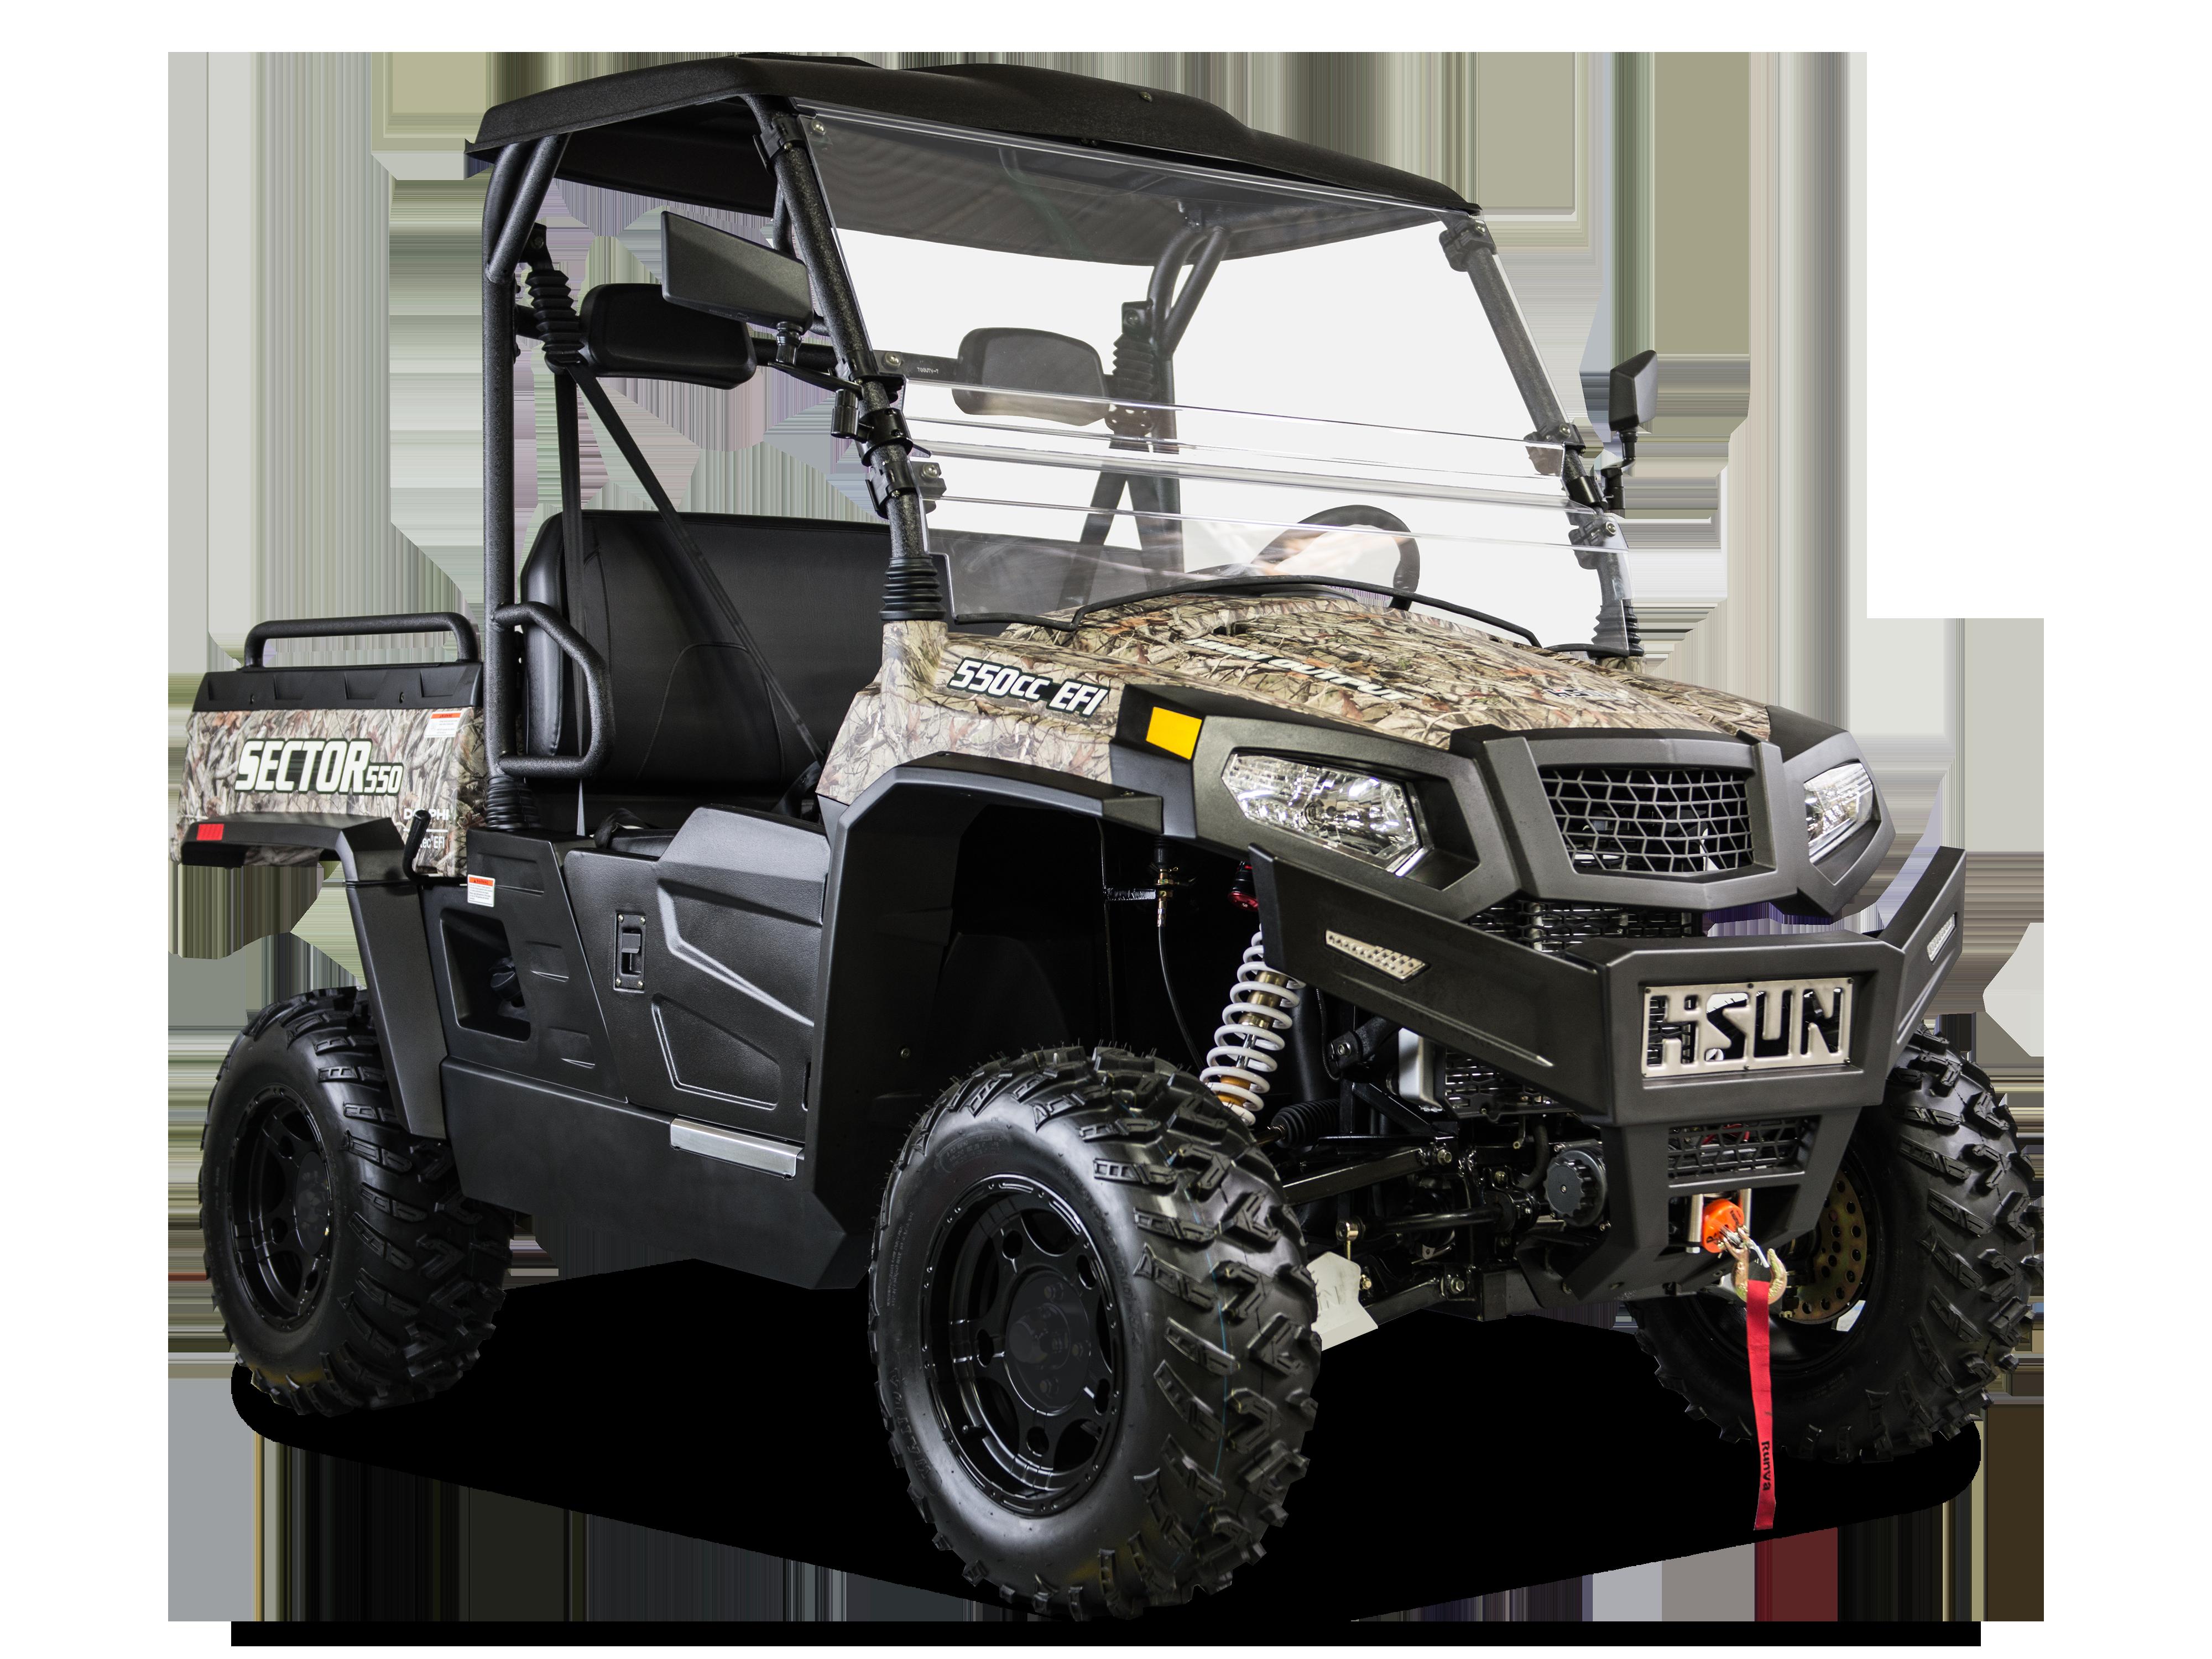 svg freeuse Hisun motors sector features. Vector 500 camo